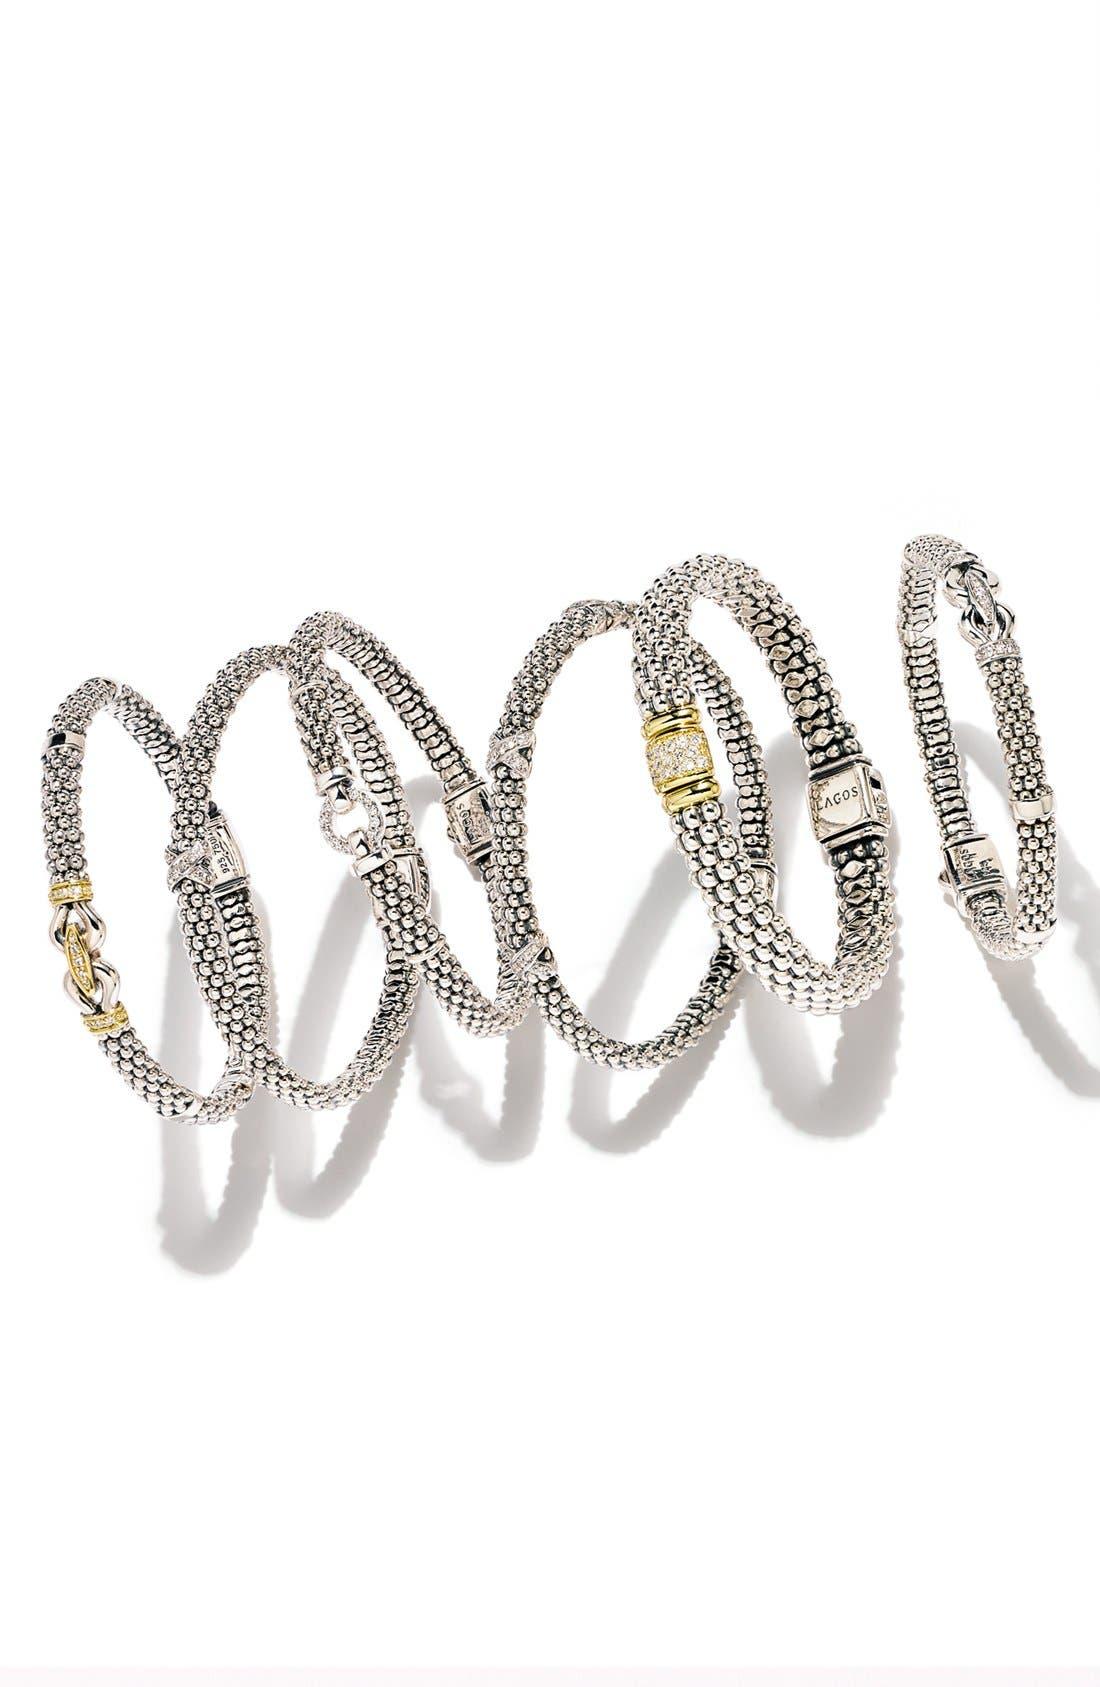 'Derby' Diamond Buckle Rope Bracelet,                             Alternate thumbnail 6, color,                             STERLING SILVER